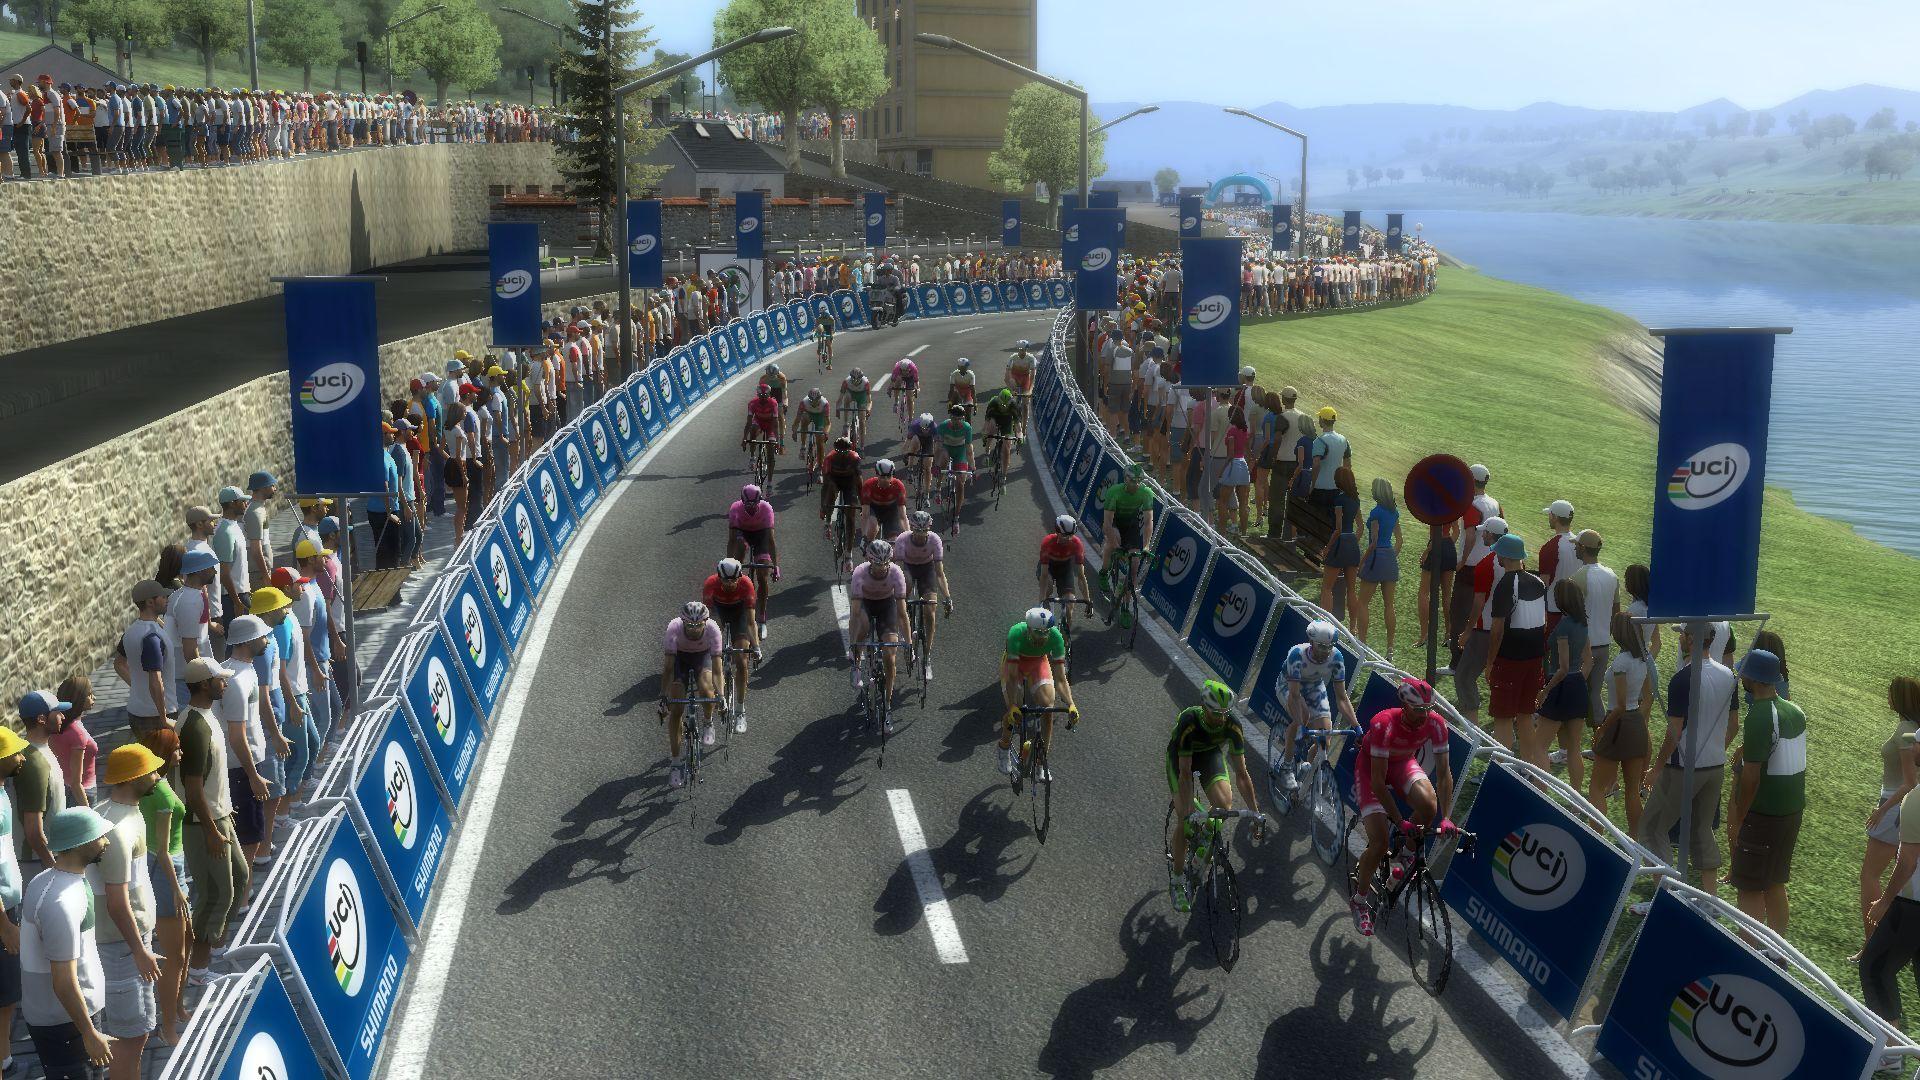 pcmdaily.com/images/mg/2018/Races/C2HC/Zuri/Zuri%2029.jpg